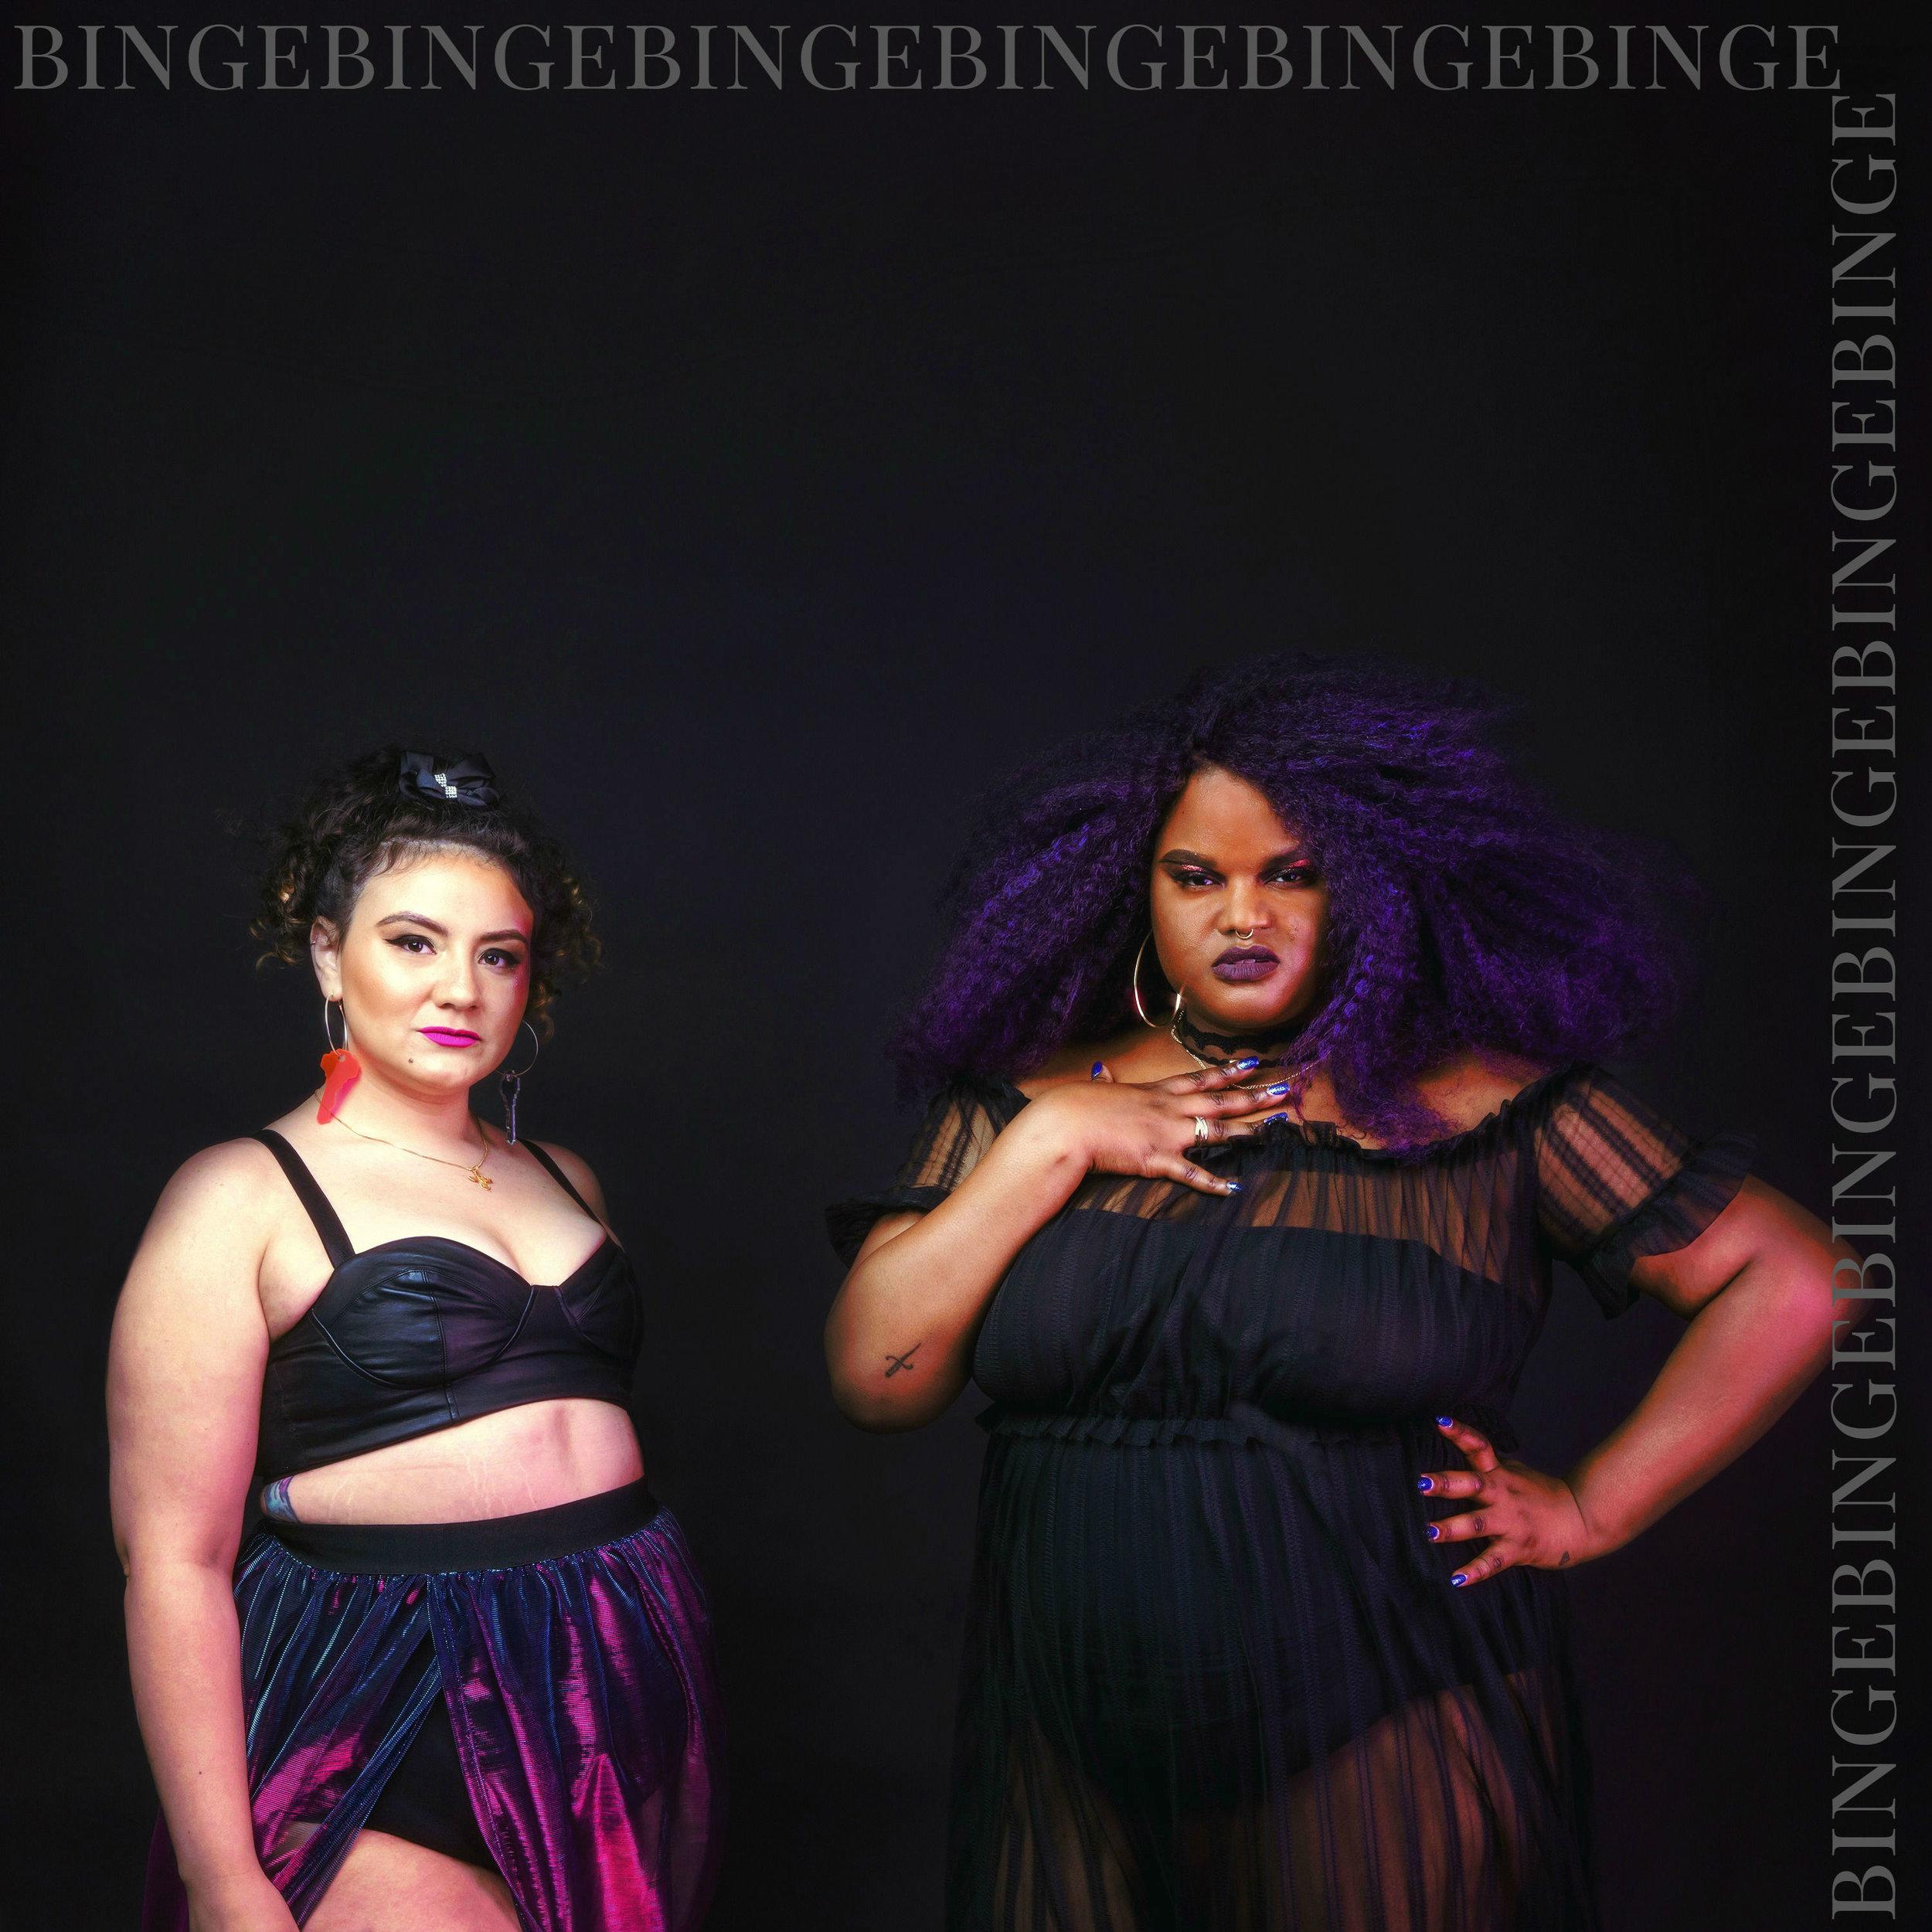 BINGE front cover (1).jpg